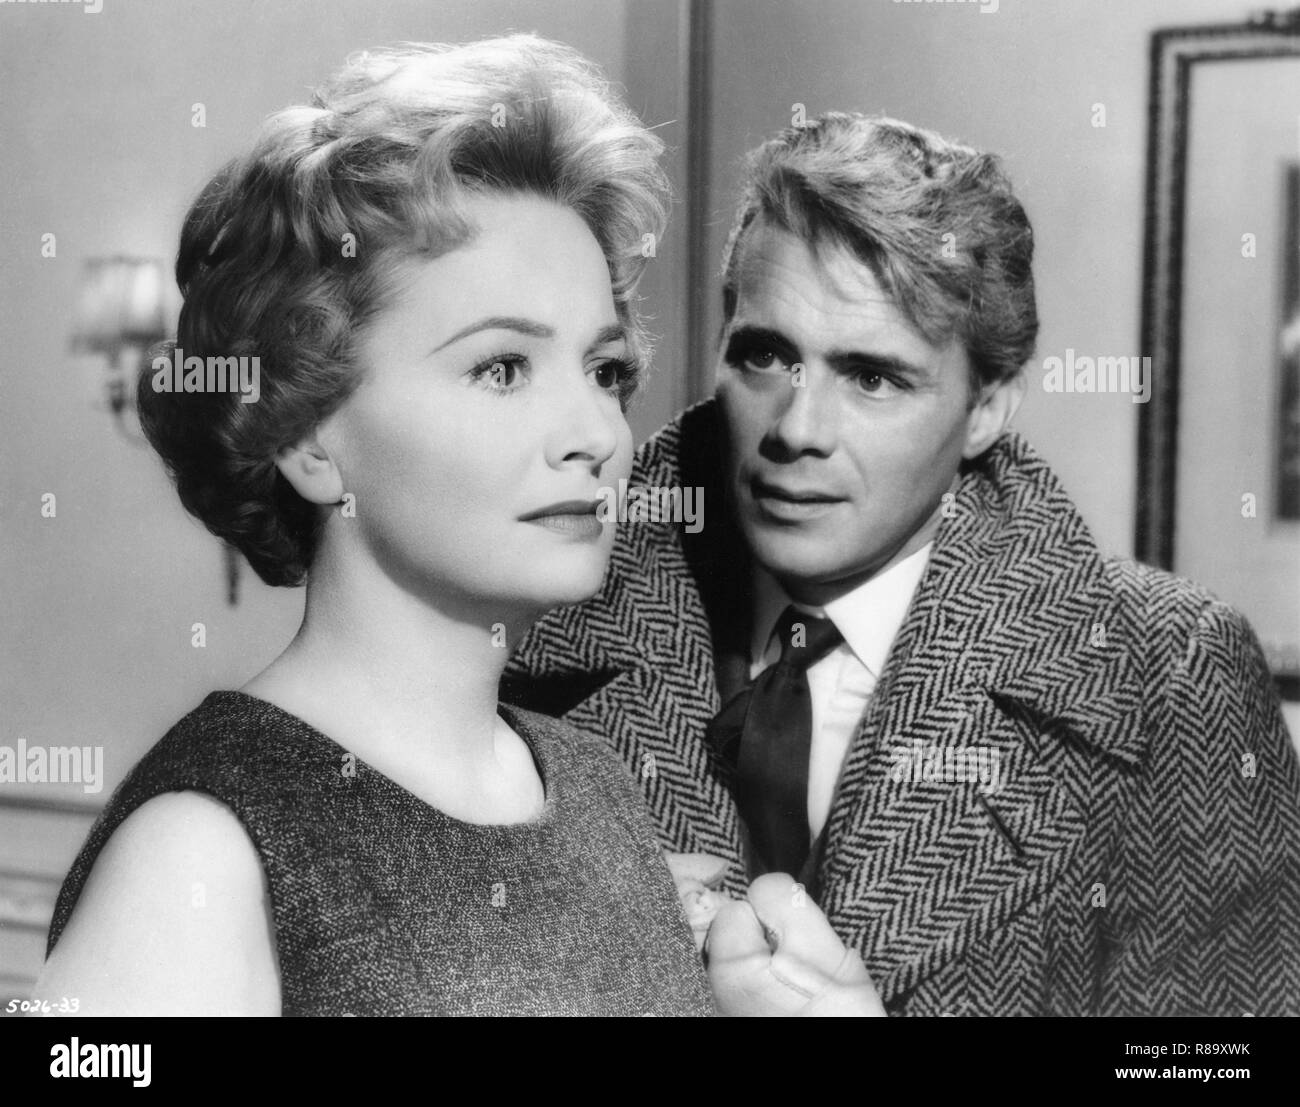 Libel Year : 1959 USA / UK Director : Anthony Asquith Olivia de Havilland, Dirk Bogarde - Stock Image